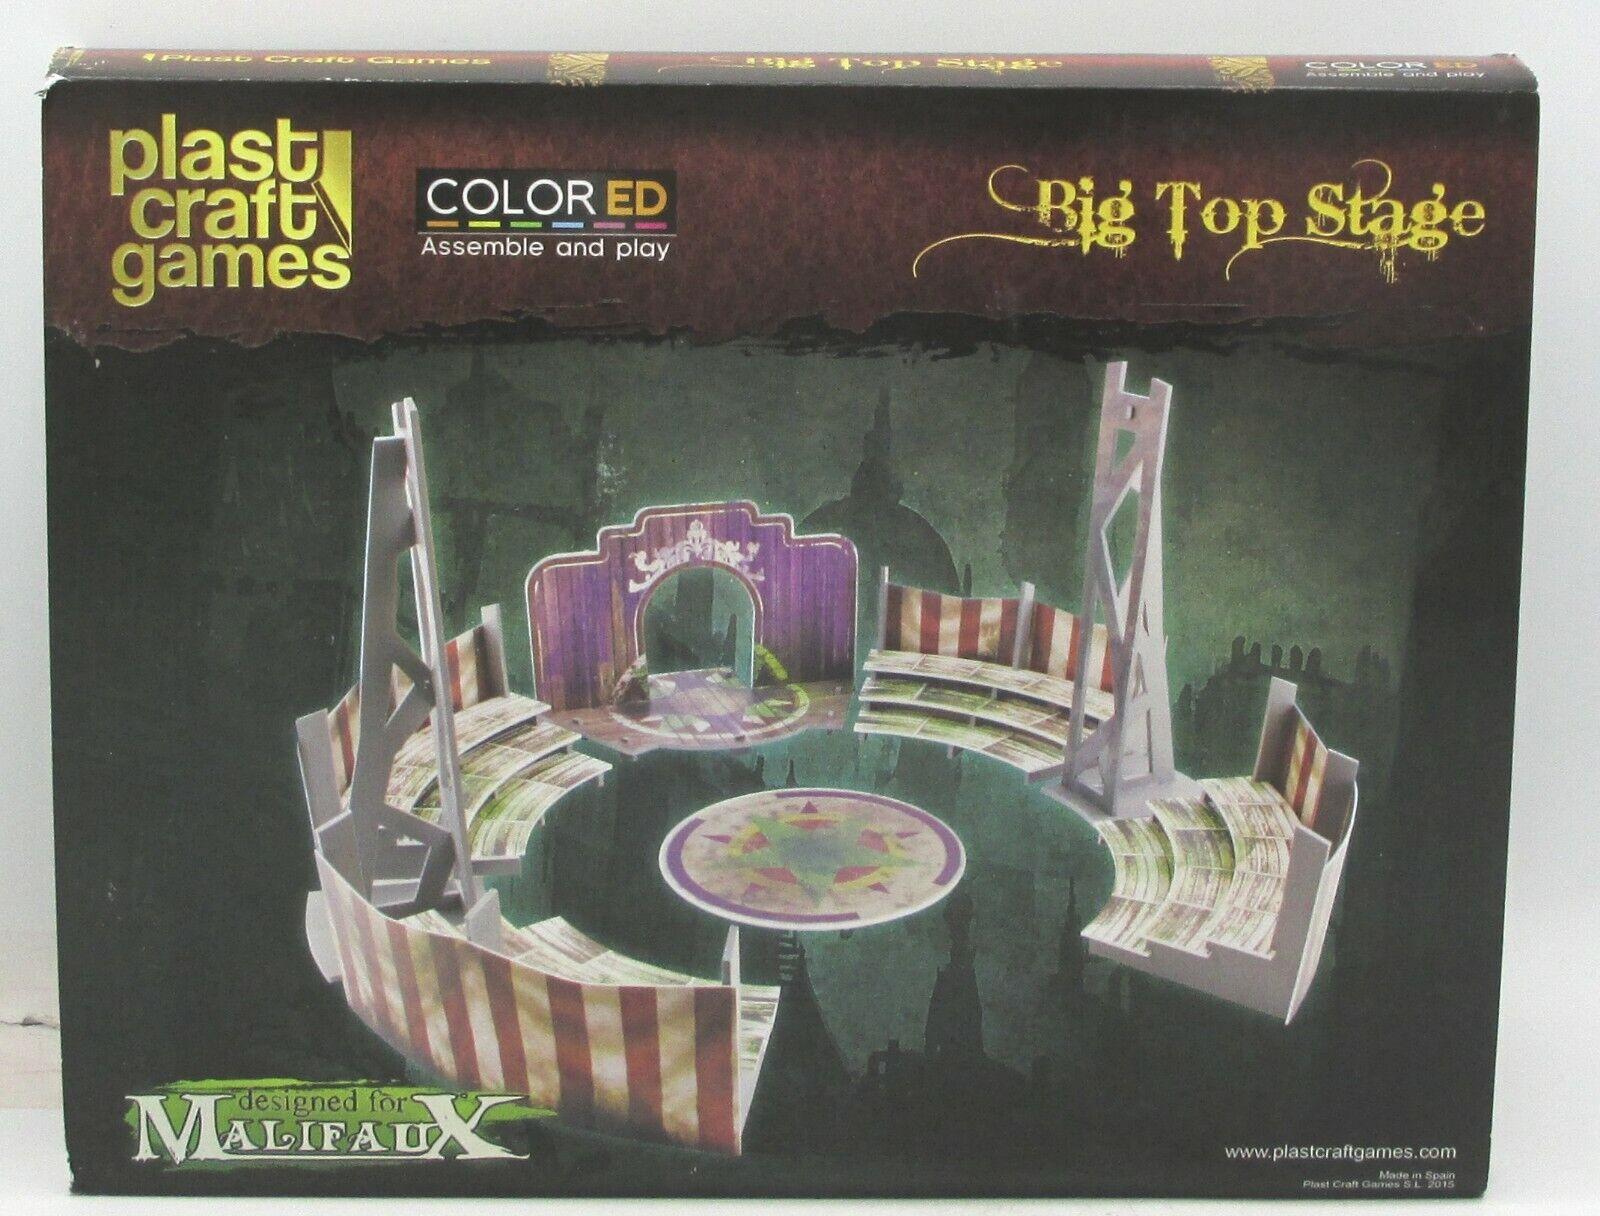 Plast Craft Games MF014 Big Top Stage (Malifaux ) colorEd Terrain Set Circus NIB